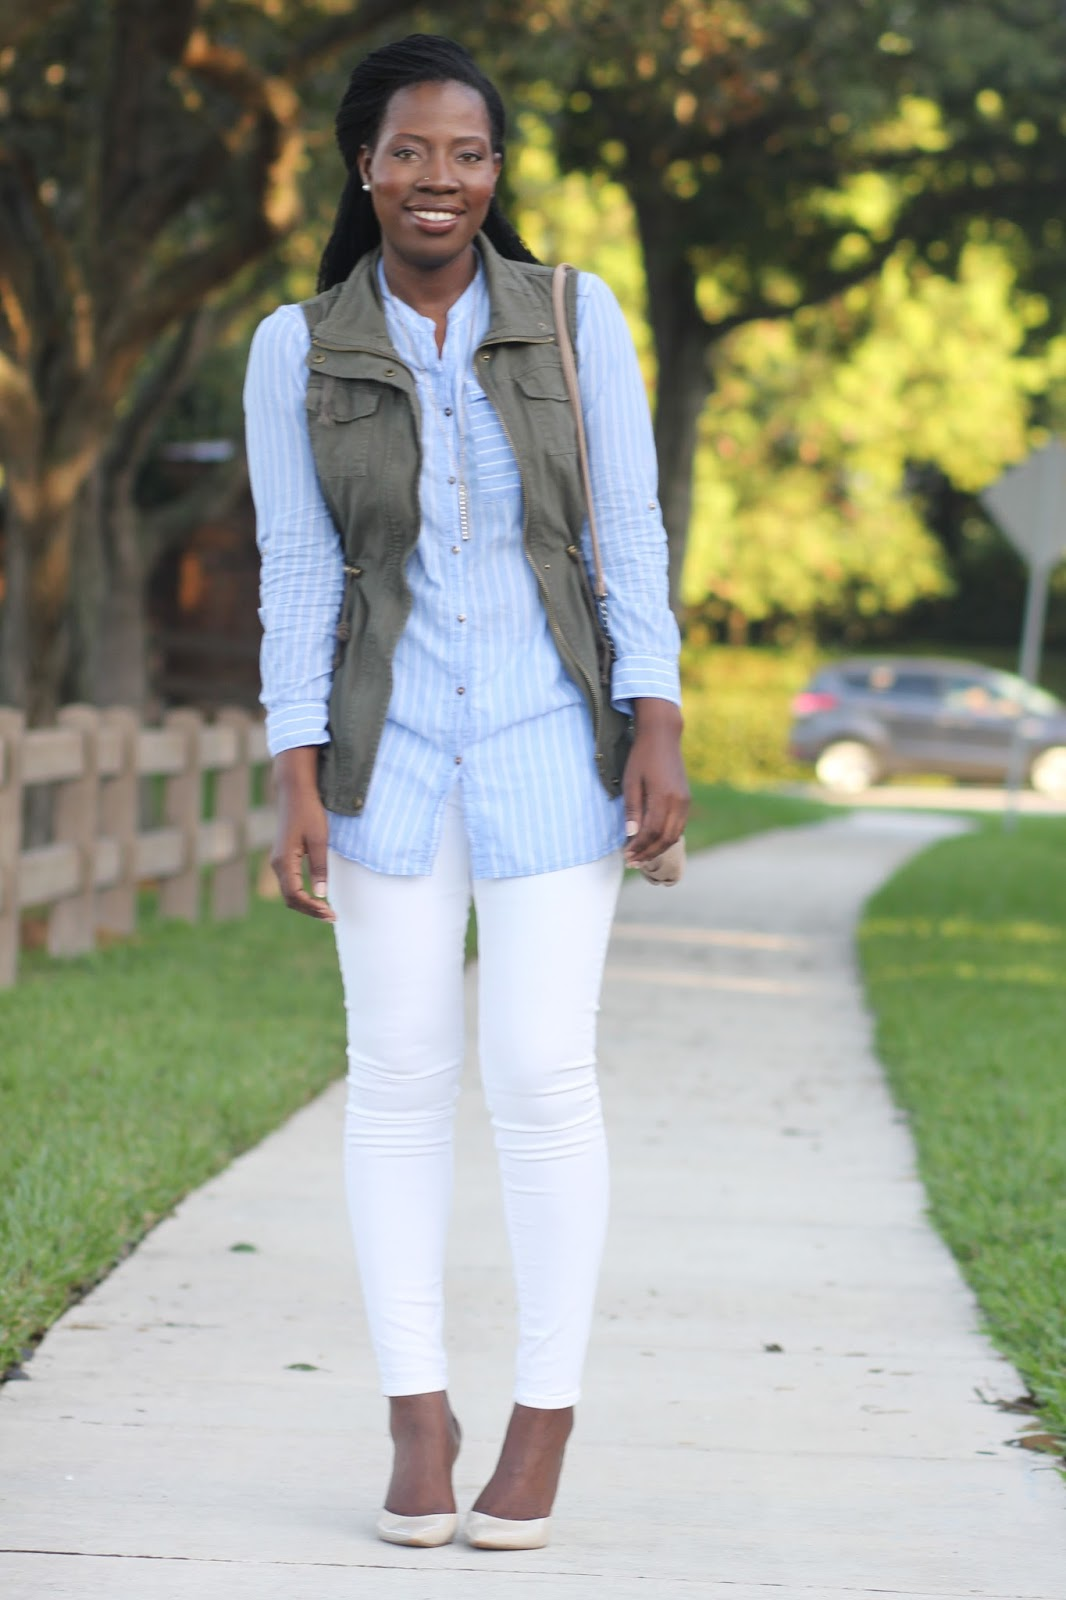 Outfit Consist of Shirt Dress (H M)   Olive Vest (Nordstrom Rack)   Skinny  Jeans (Express)   Slingback Pumps (Guess)   Purse (Nine West) d6716ec267a4